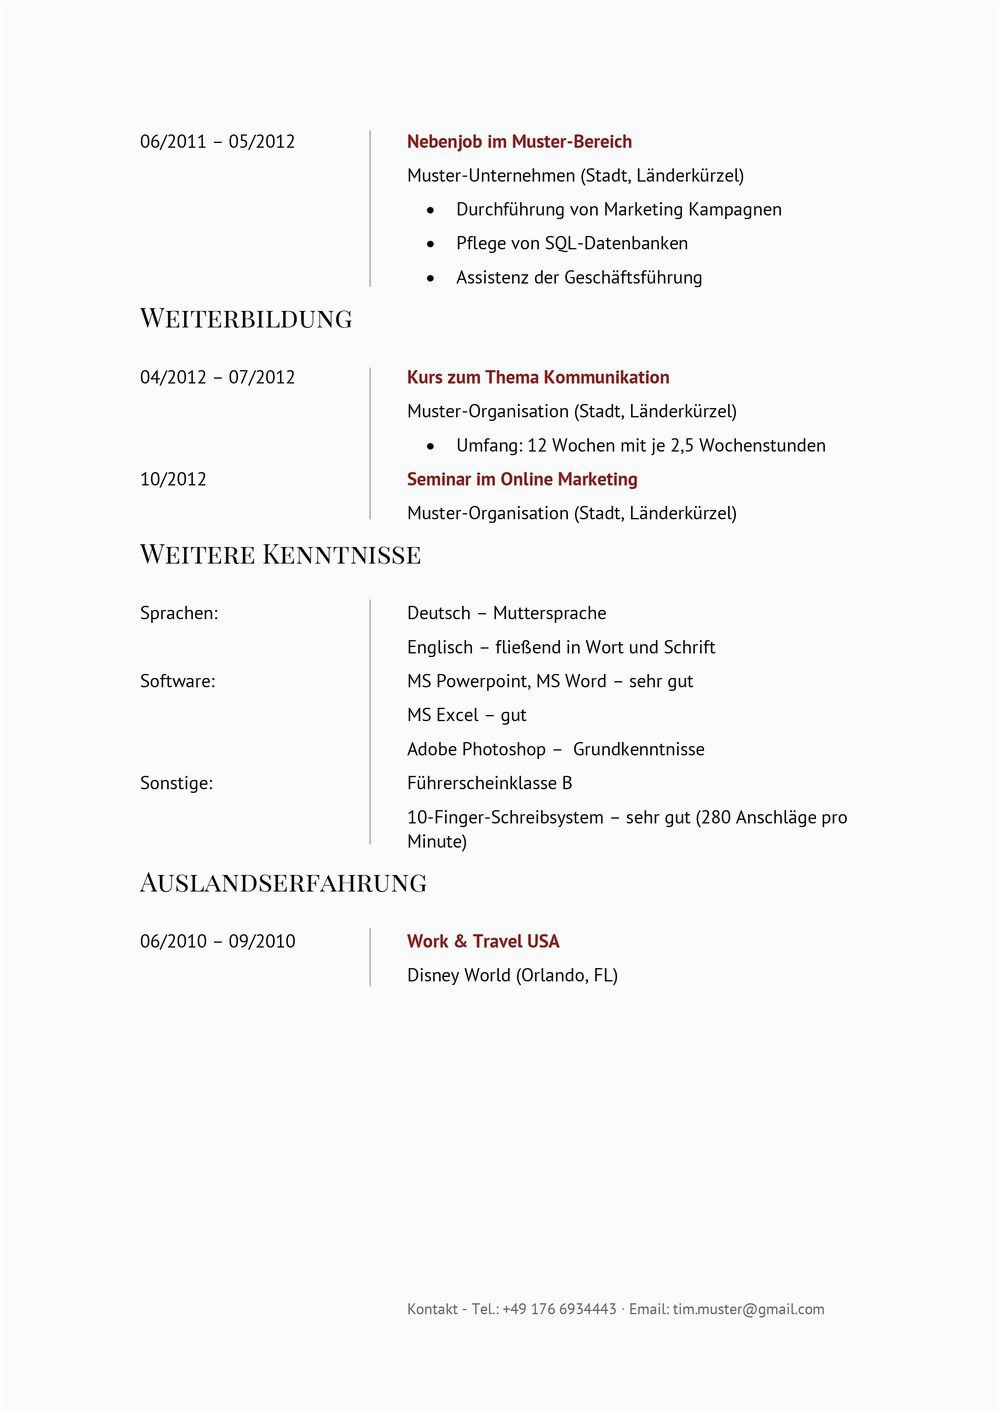 Lebenslauf Vorlage Jobscout24 Lebenslauf Muster Blau 02 Pandopu Developer